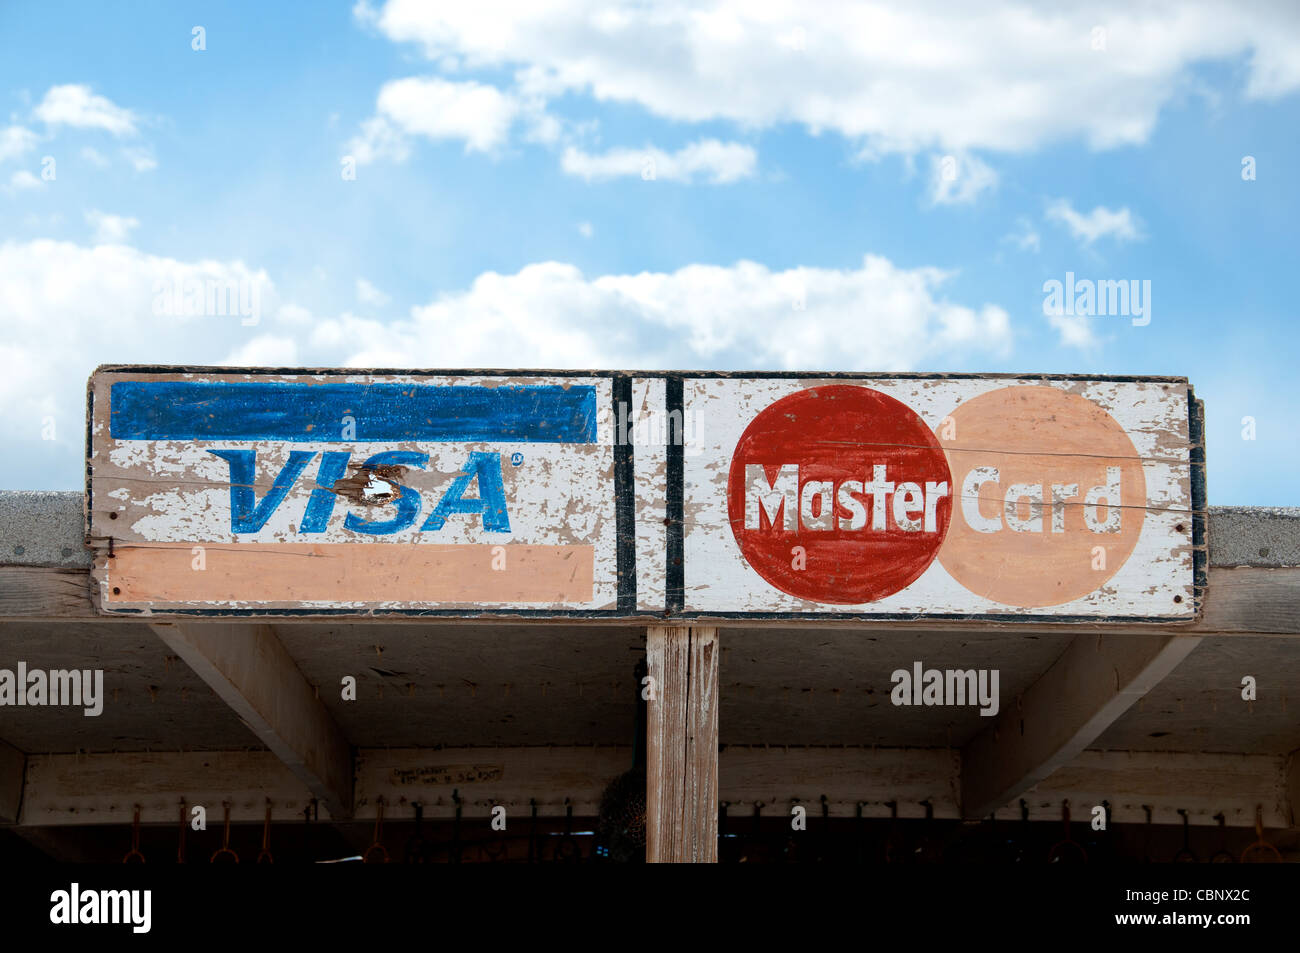 Visa San Francisco California United States Mastercard  New York United States - Stock Image